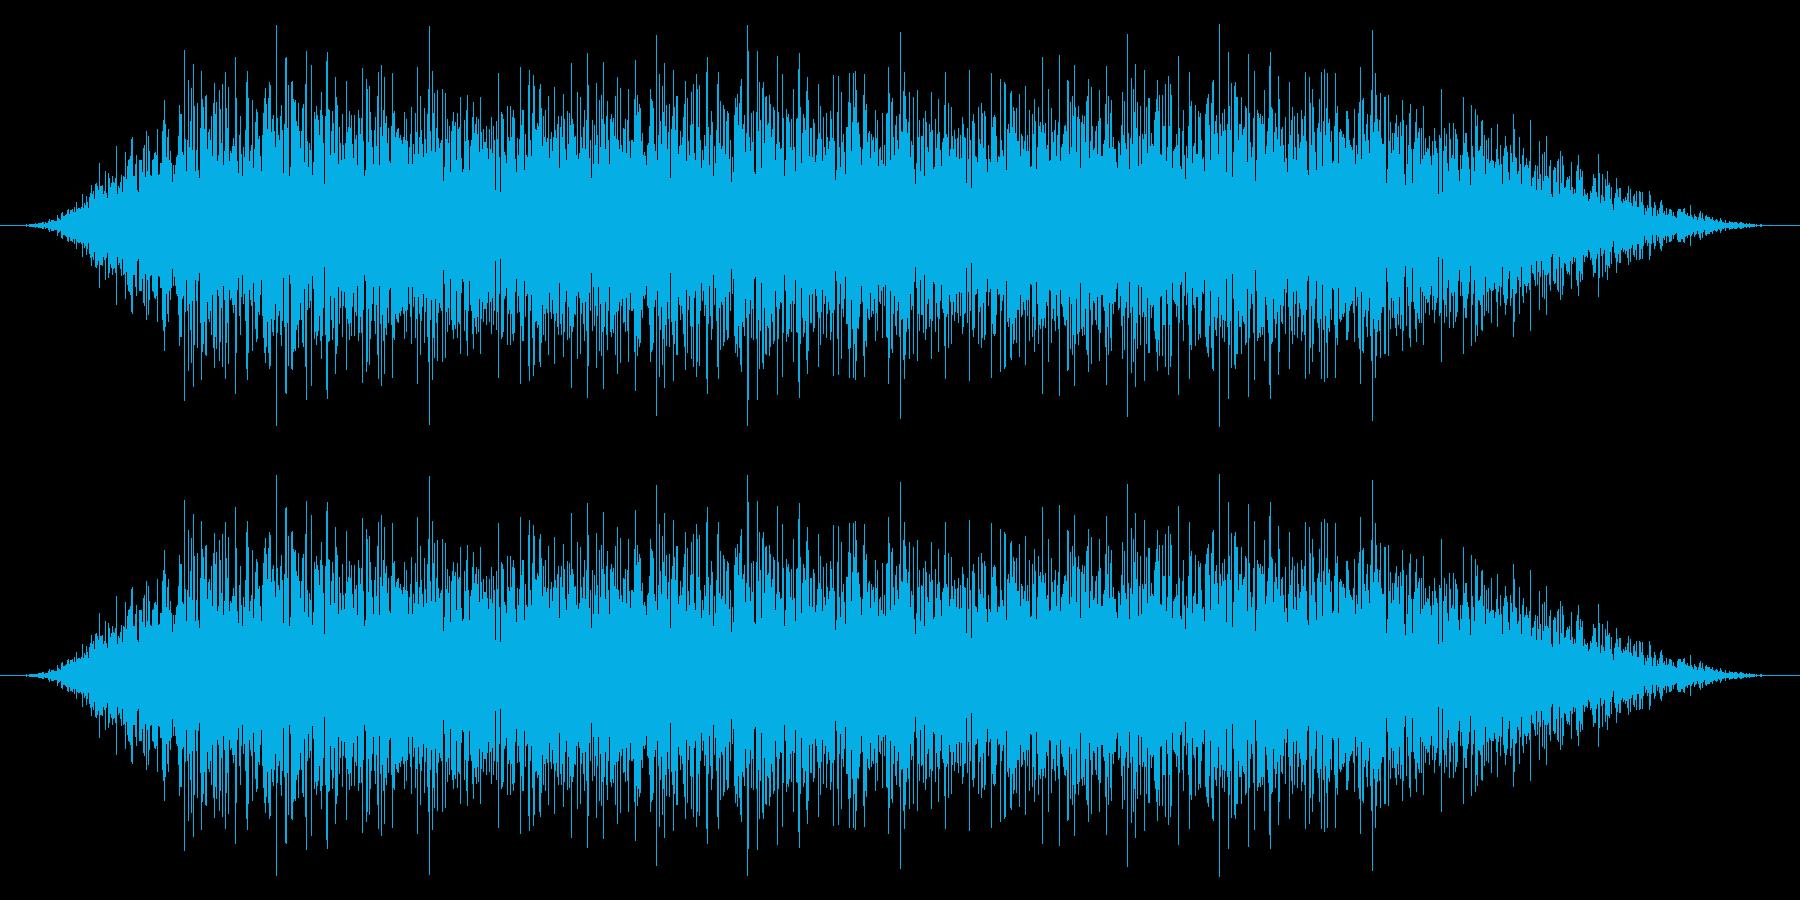 SNES サッカー01-10(歓声)の再生済みの波形